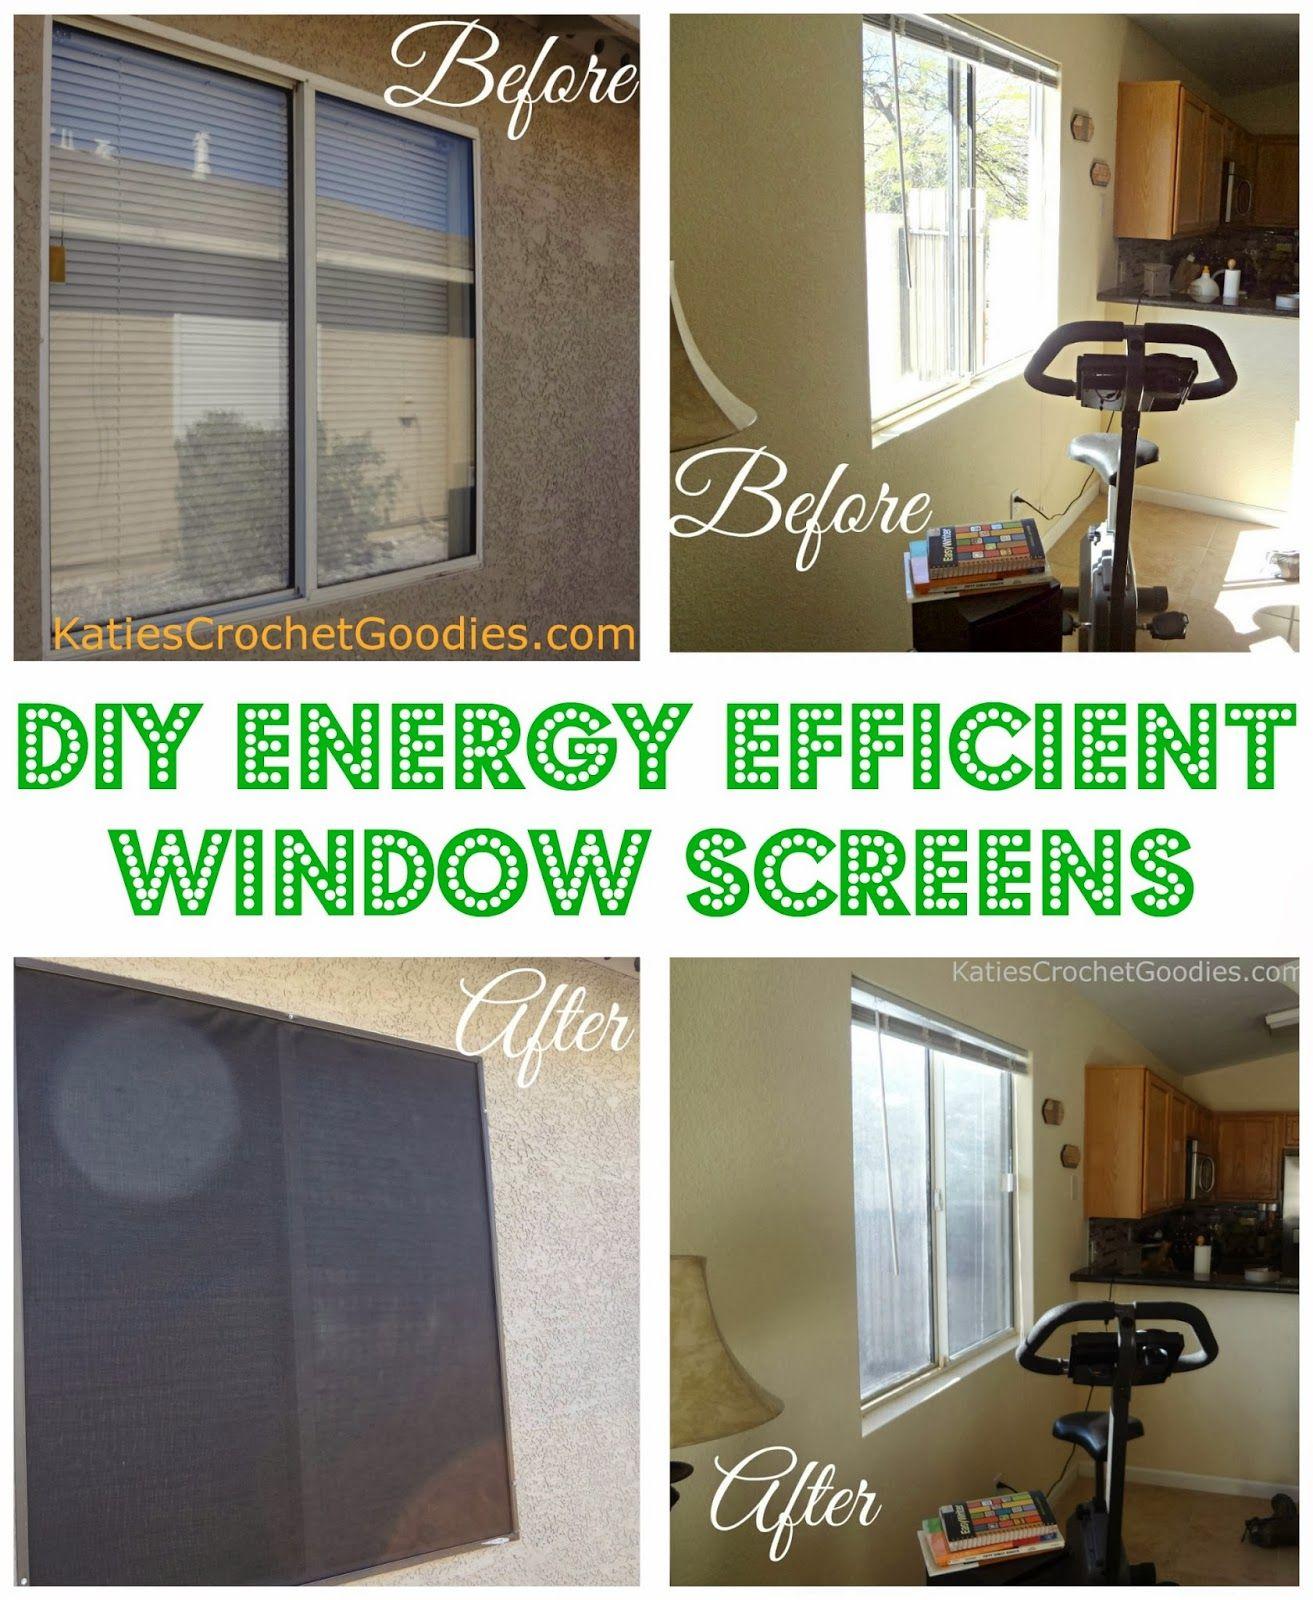 Diy Energy Efficient Window Screens Save Every Month Energysaver Budgeting